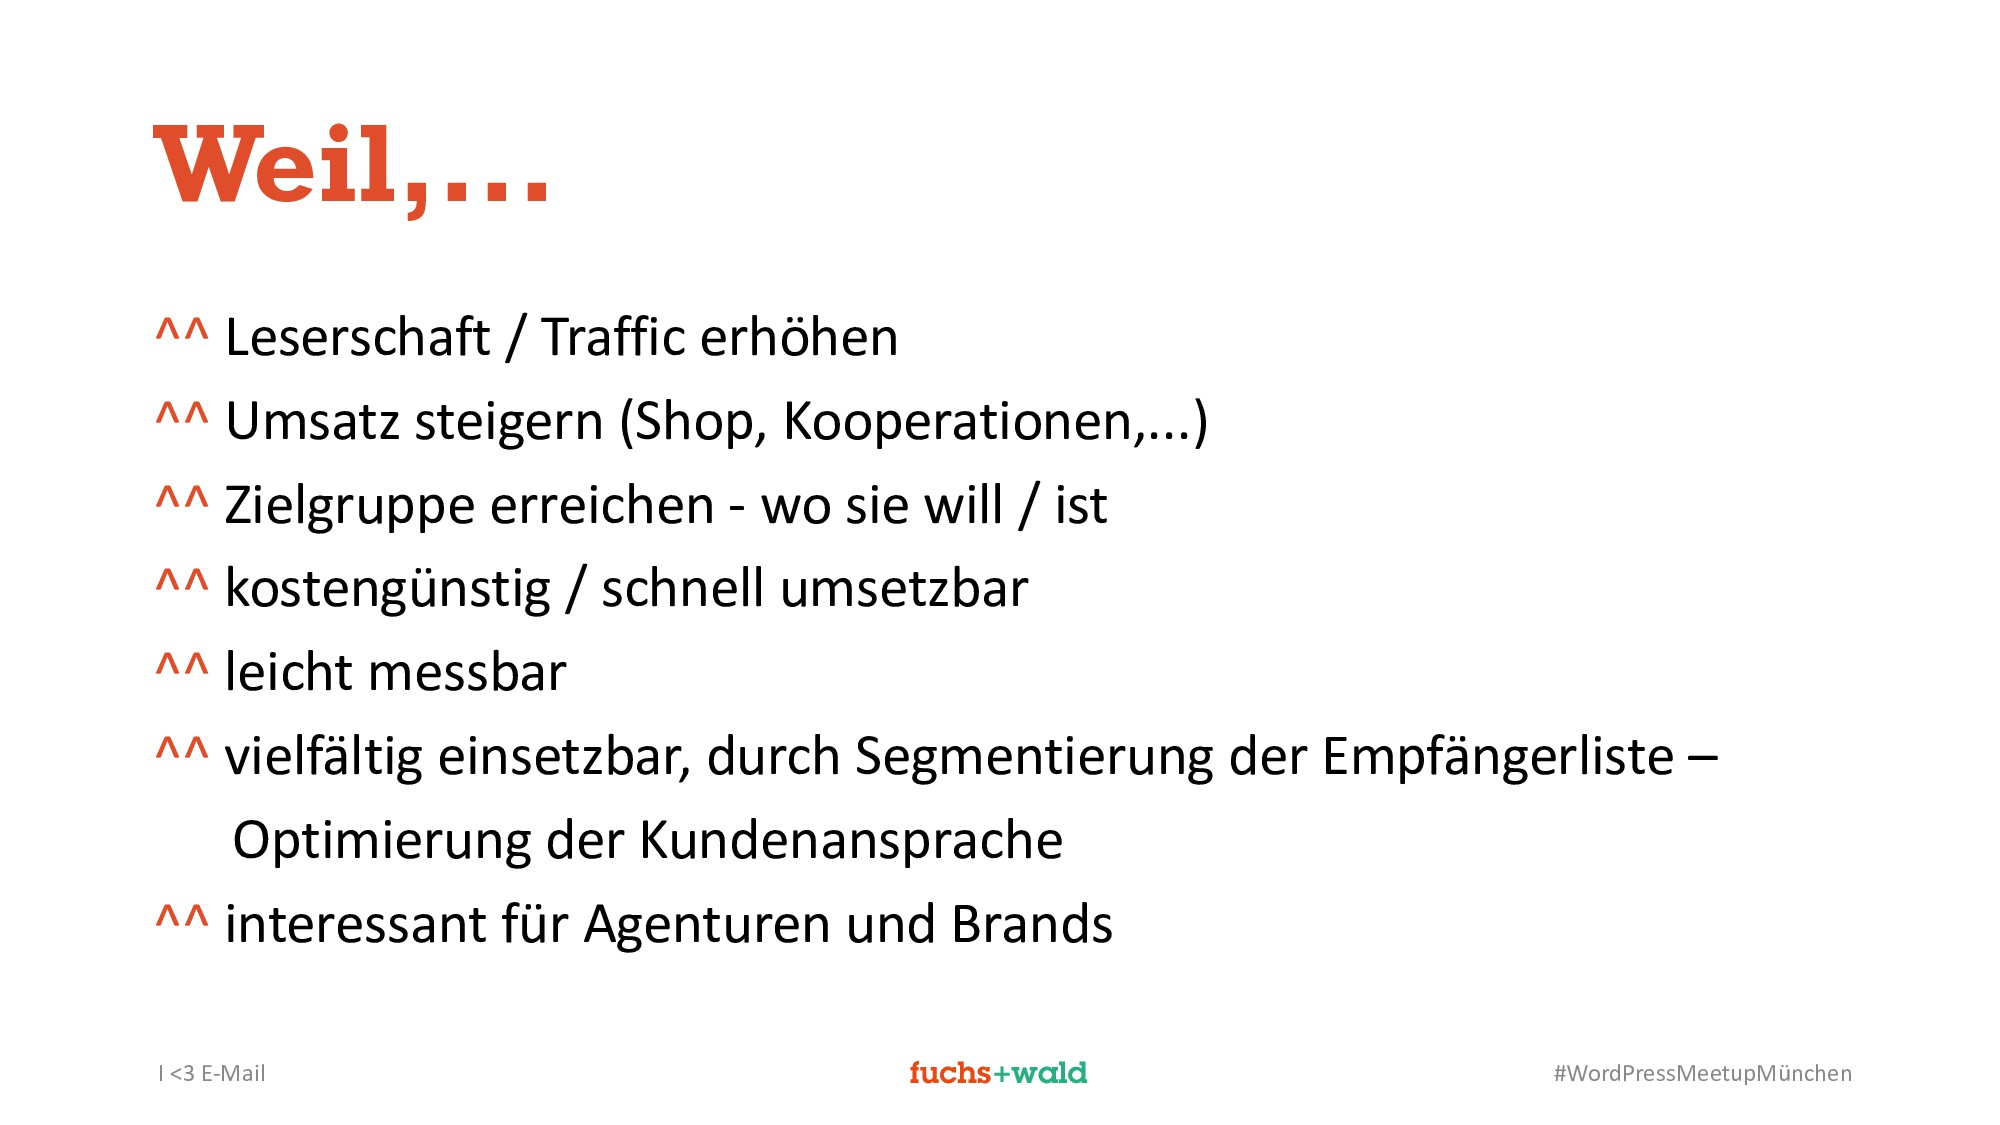 I <3 E-Mail #WordPressMeetupMünchen Weil,... ^^...